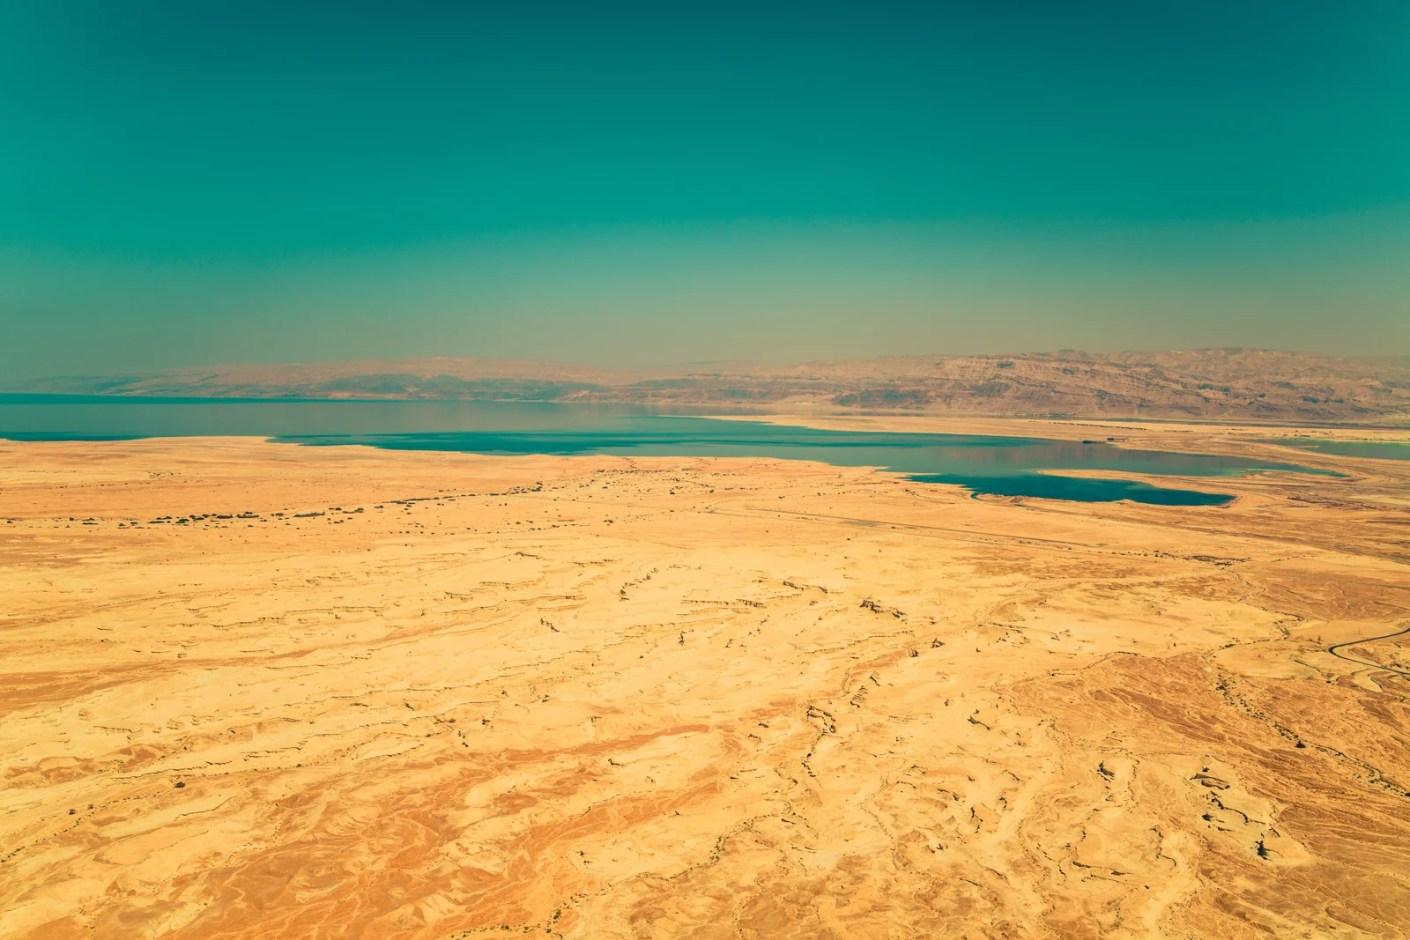 The Dead Sea. (Photo by Sammy Leigh Scholl/Unsplash)